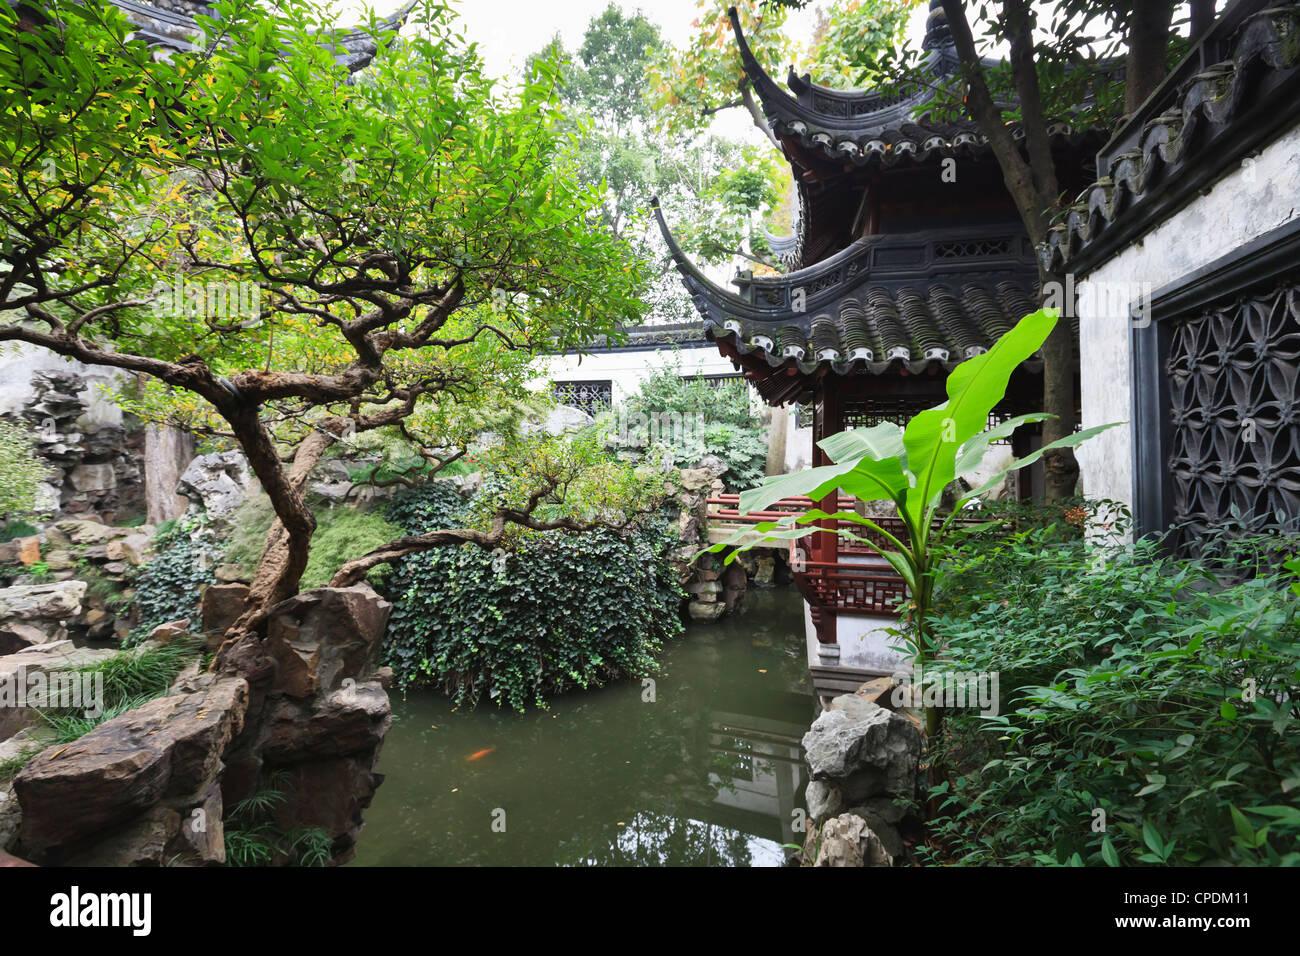 Yu Gardens (Yuyuan Gardens), Nanshi, Shanghai, China - Stock Image